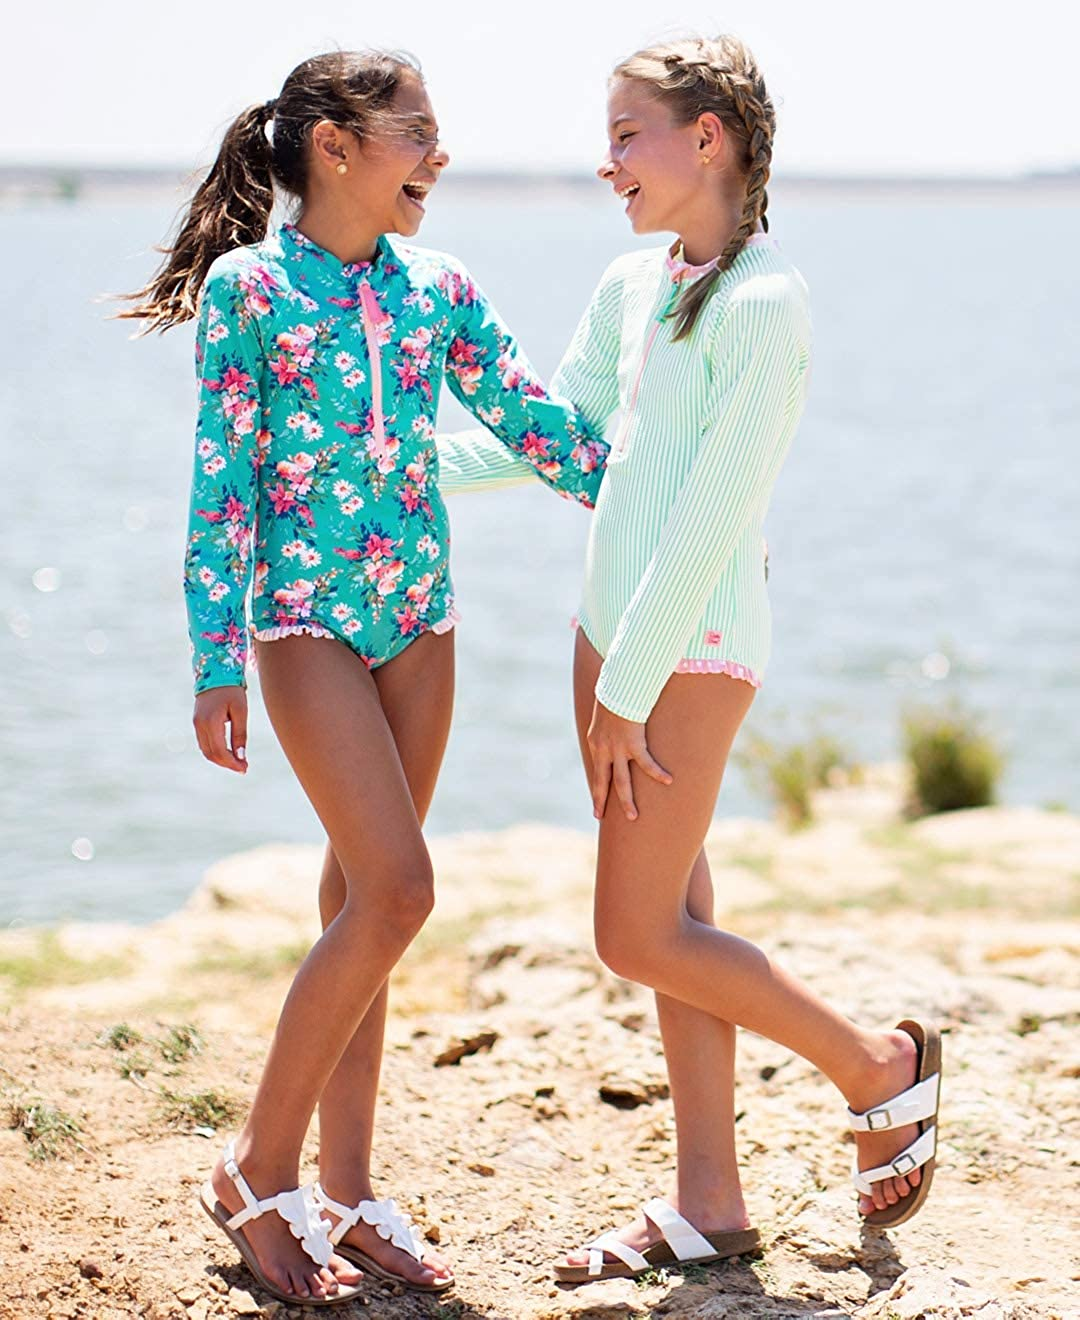 Sun Protection RGSYYXX-1PZP-SC-TDLR RuffleButts Little Girls Long Sleeve Zipper Rash Guard One Piece w//UPF 50